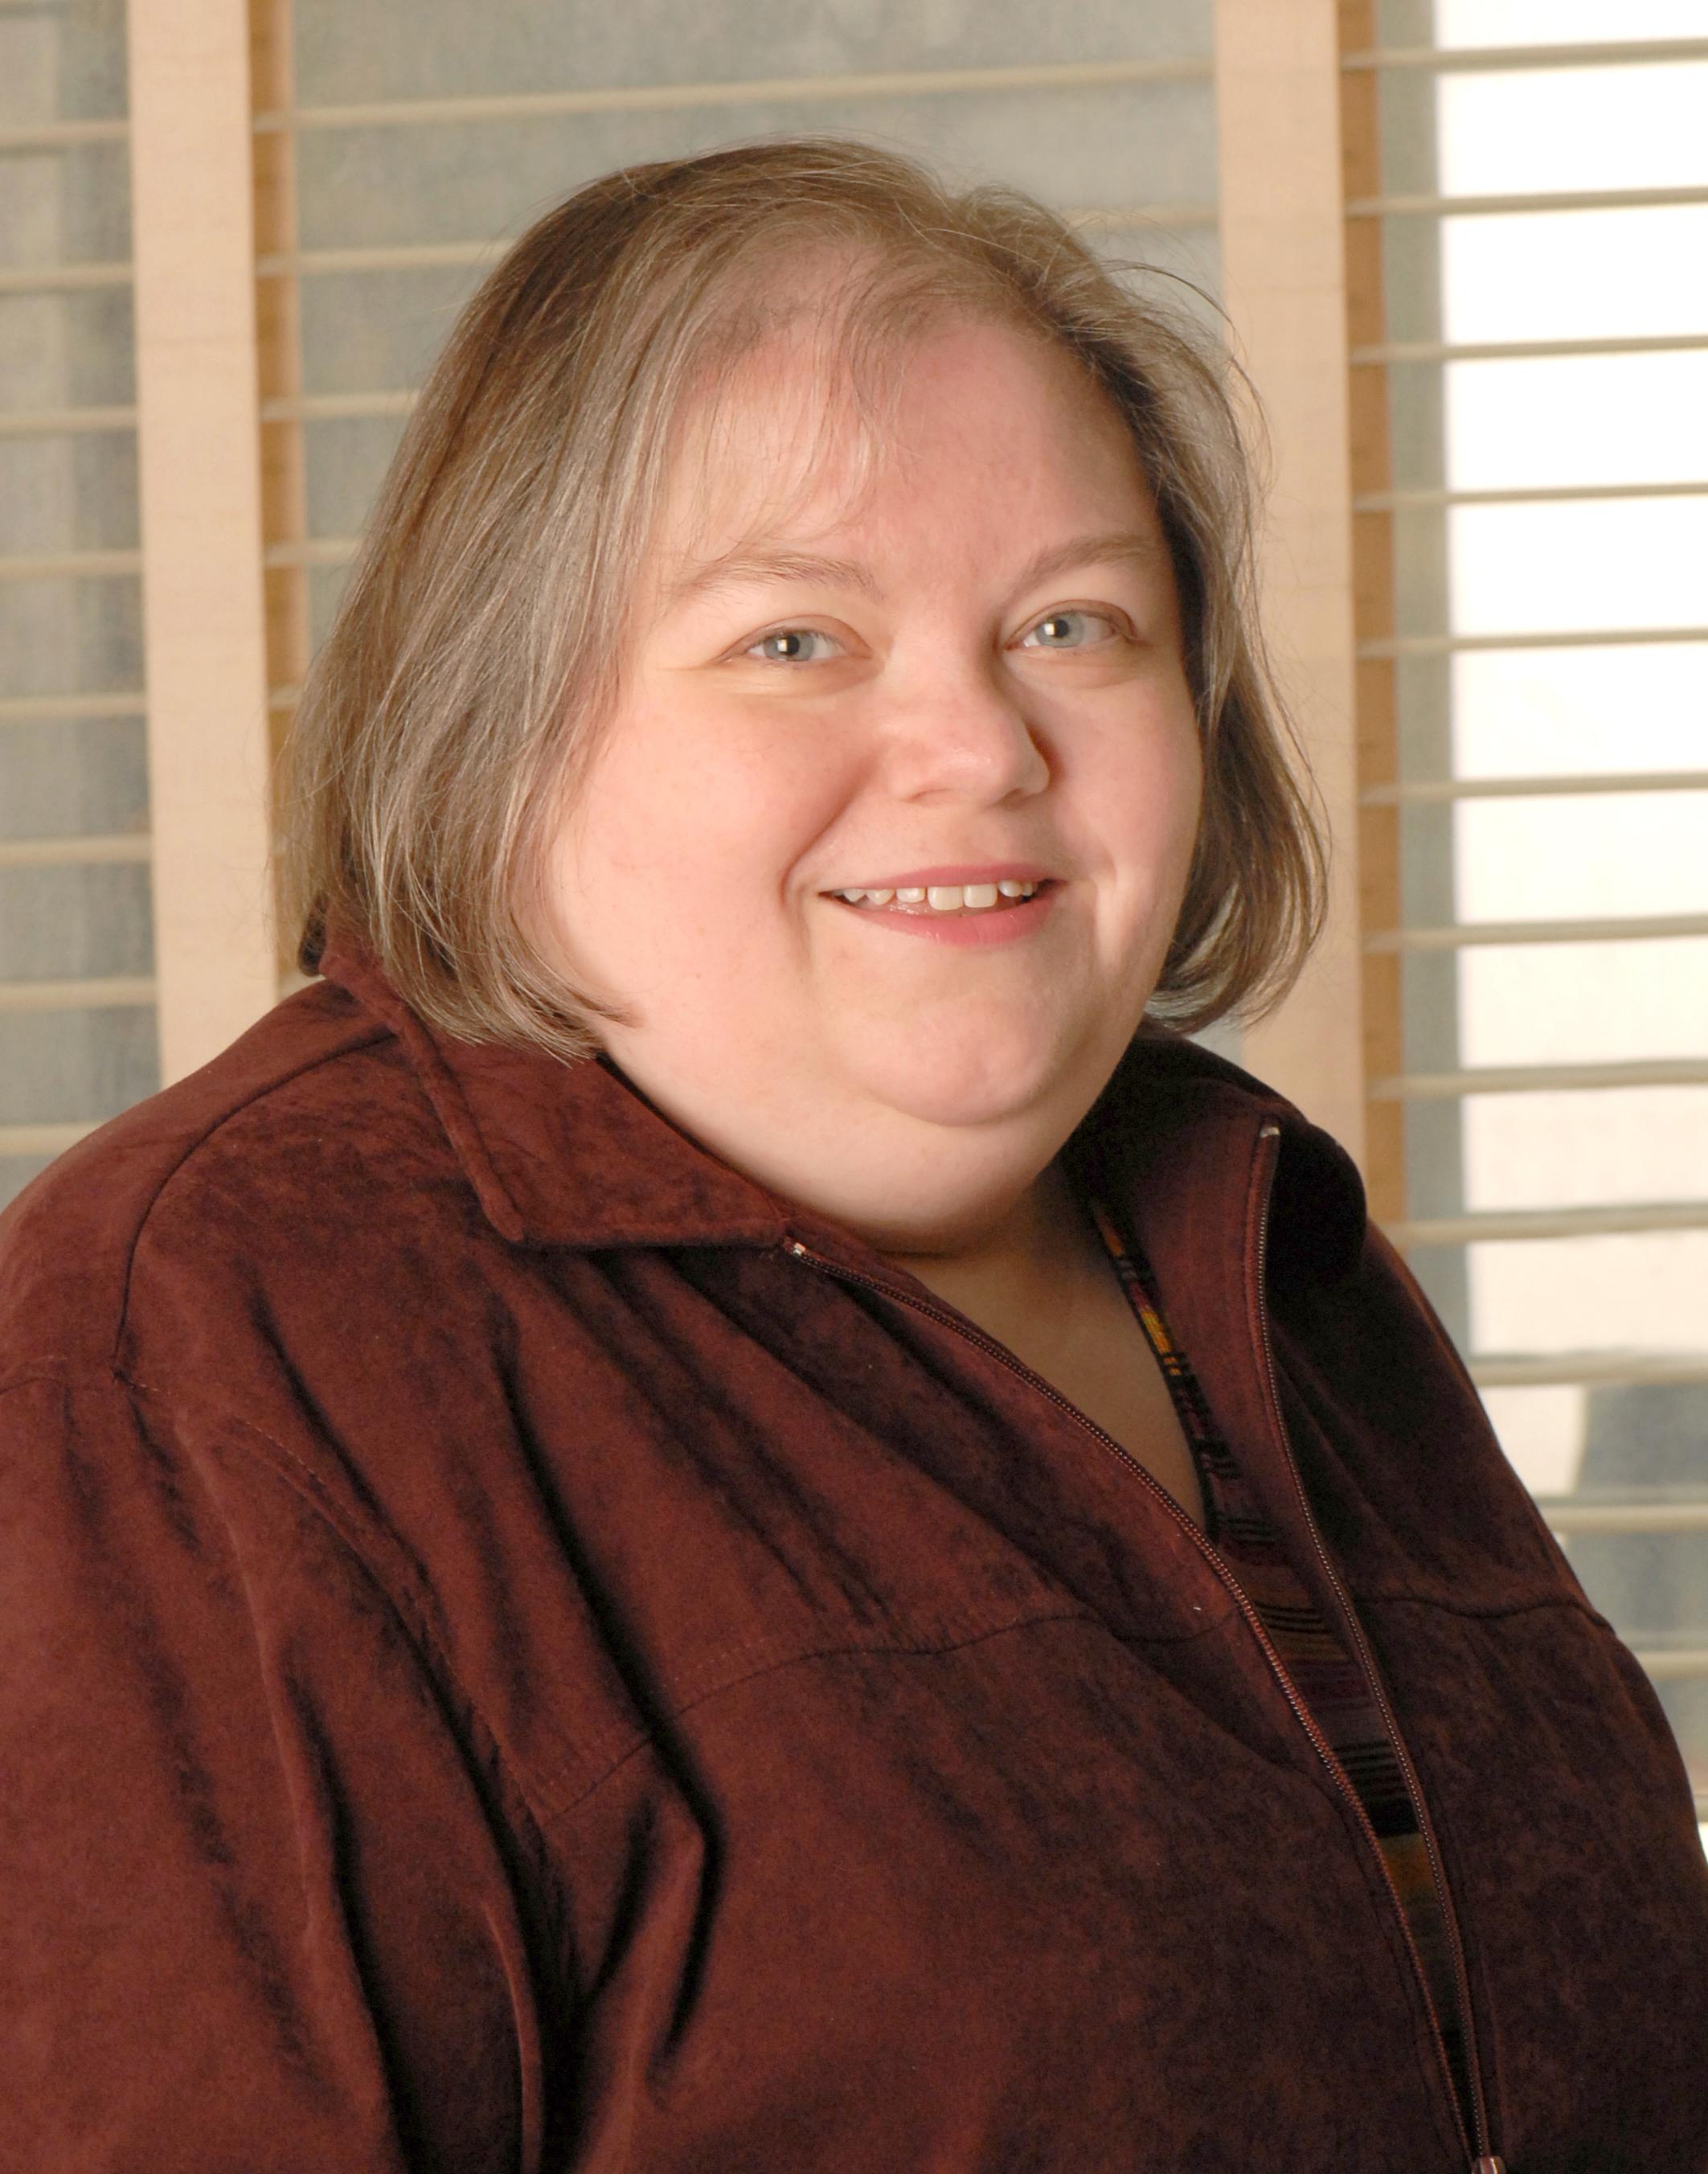 Elizabeth M Foley, Melior Group Vice President